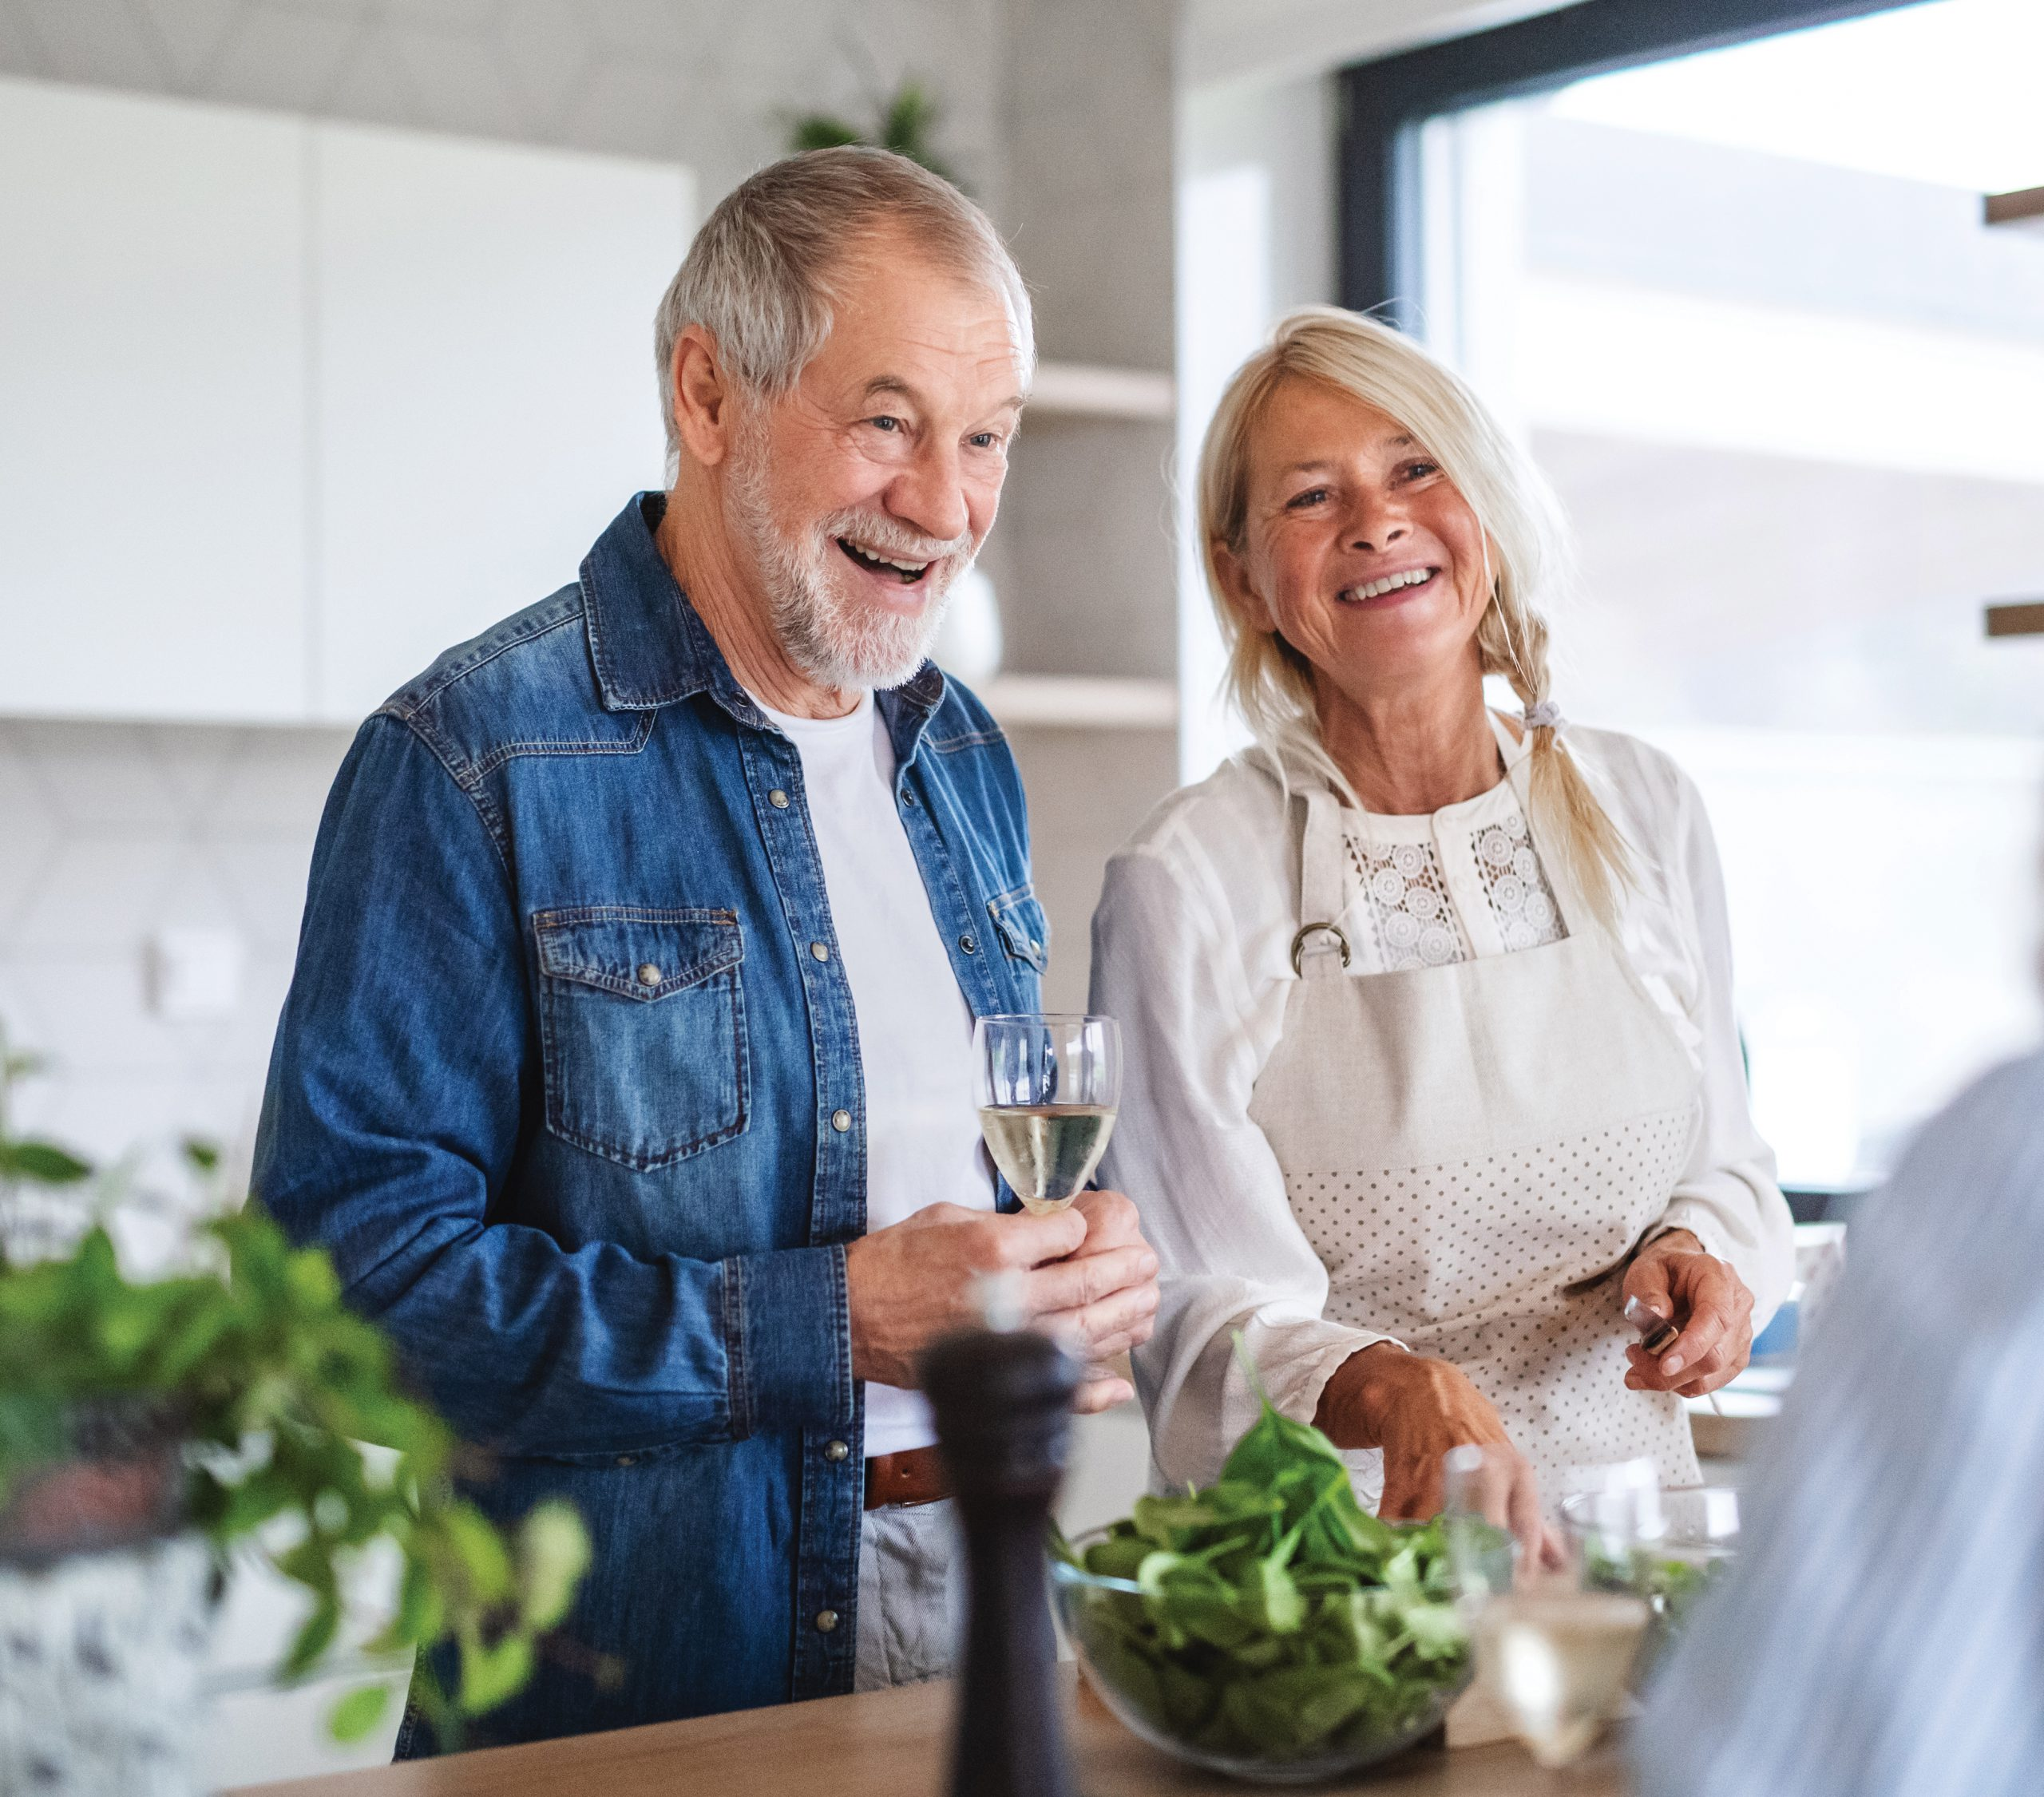 Choosing a Senior Living Community, PartTwo